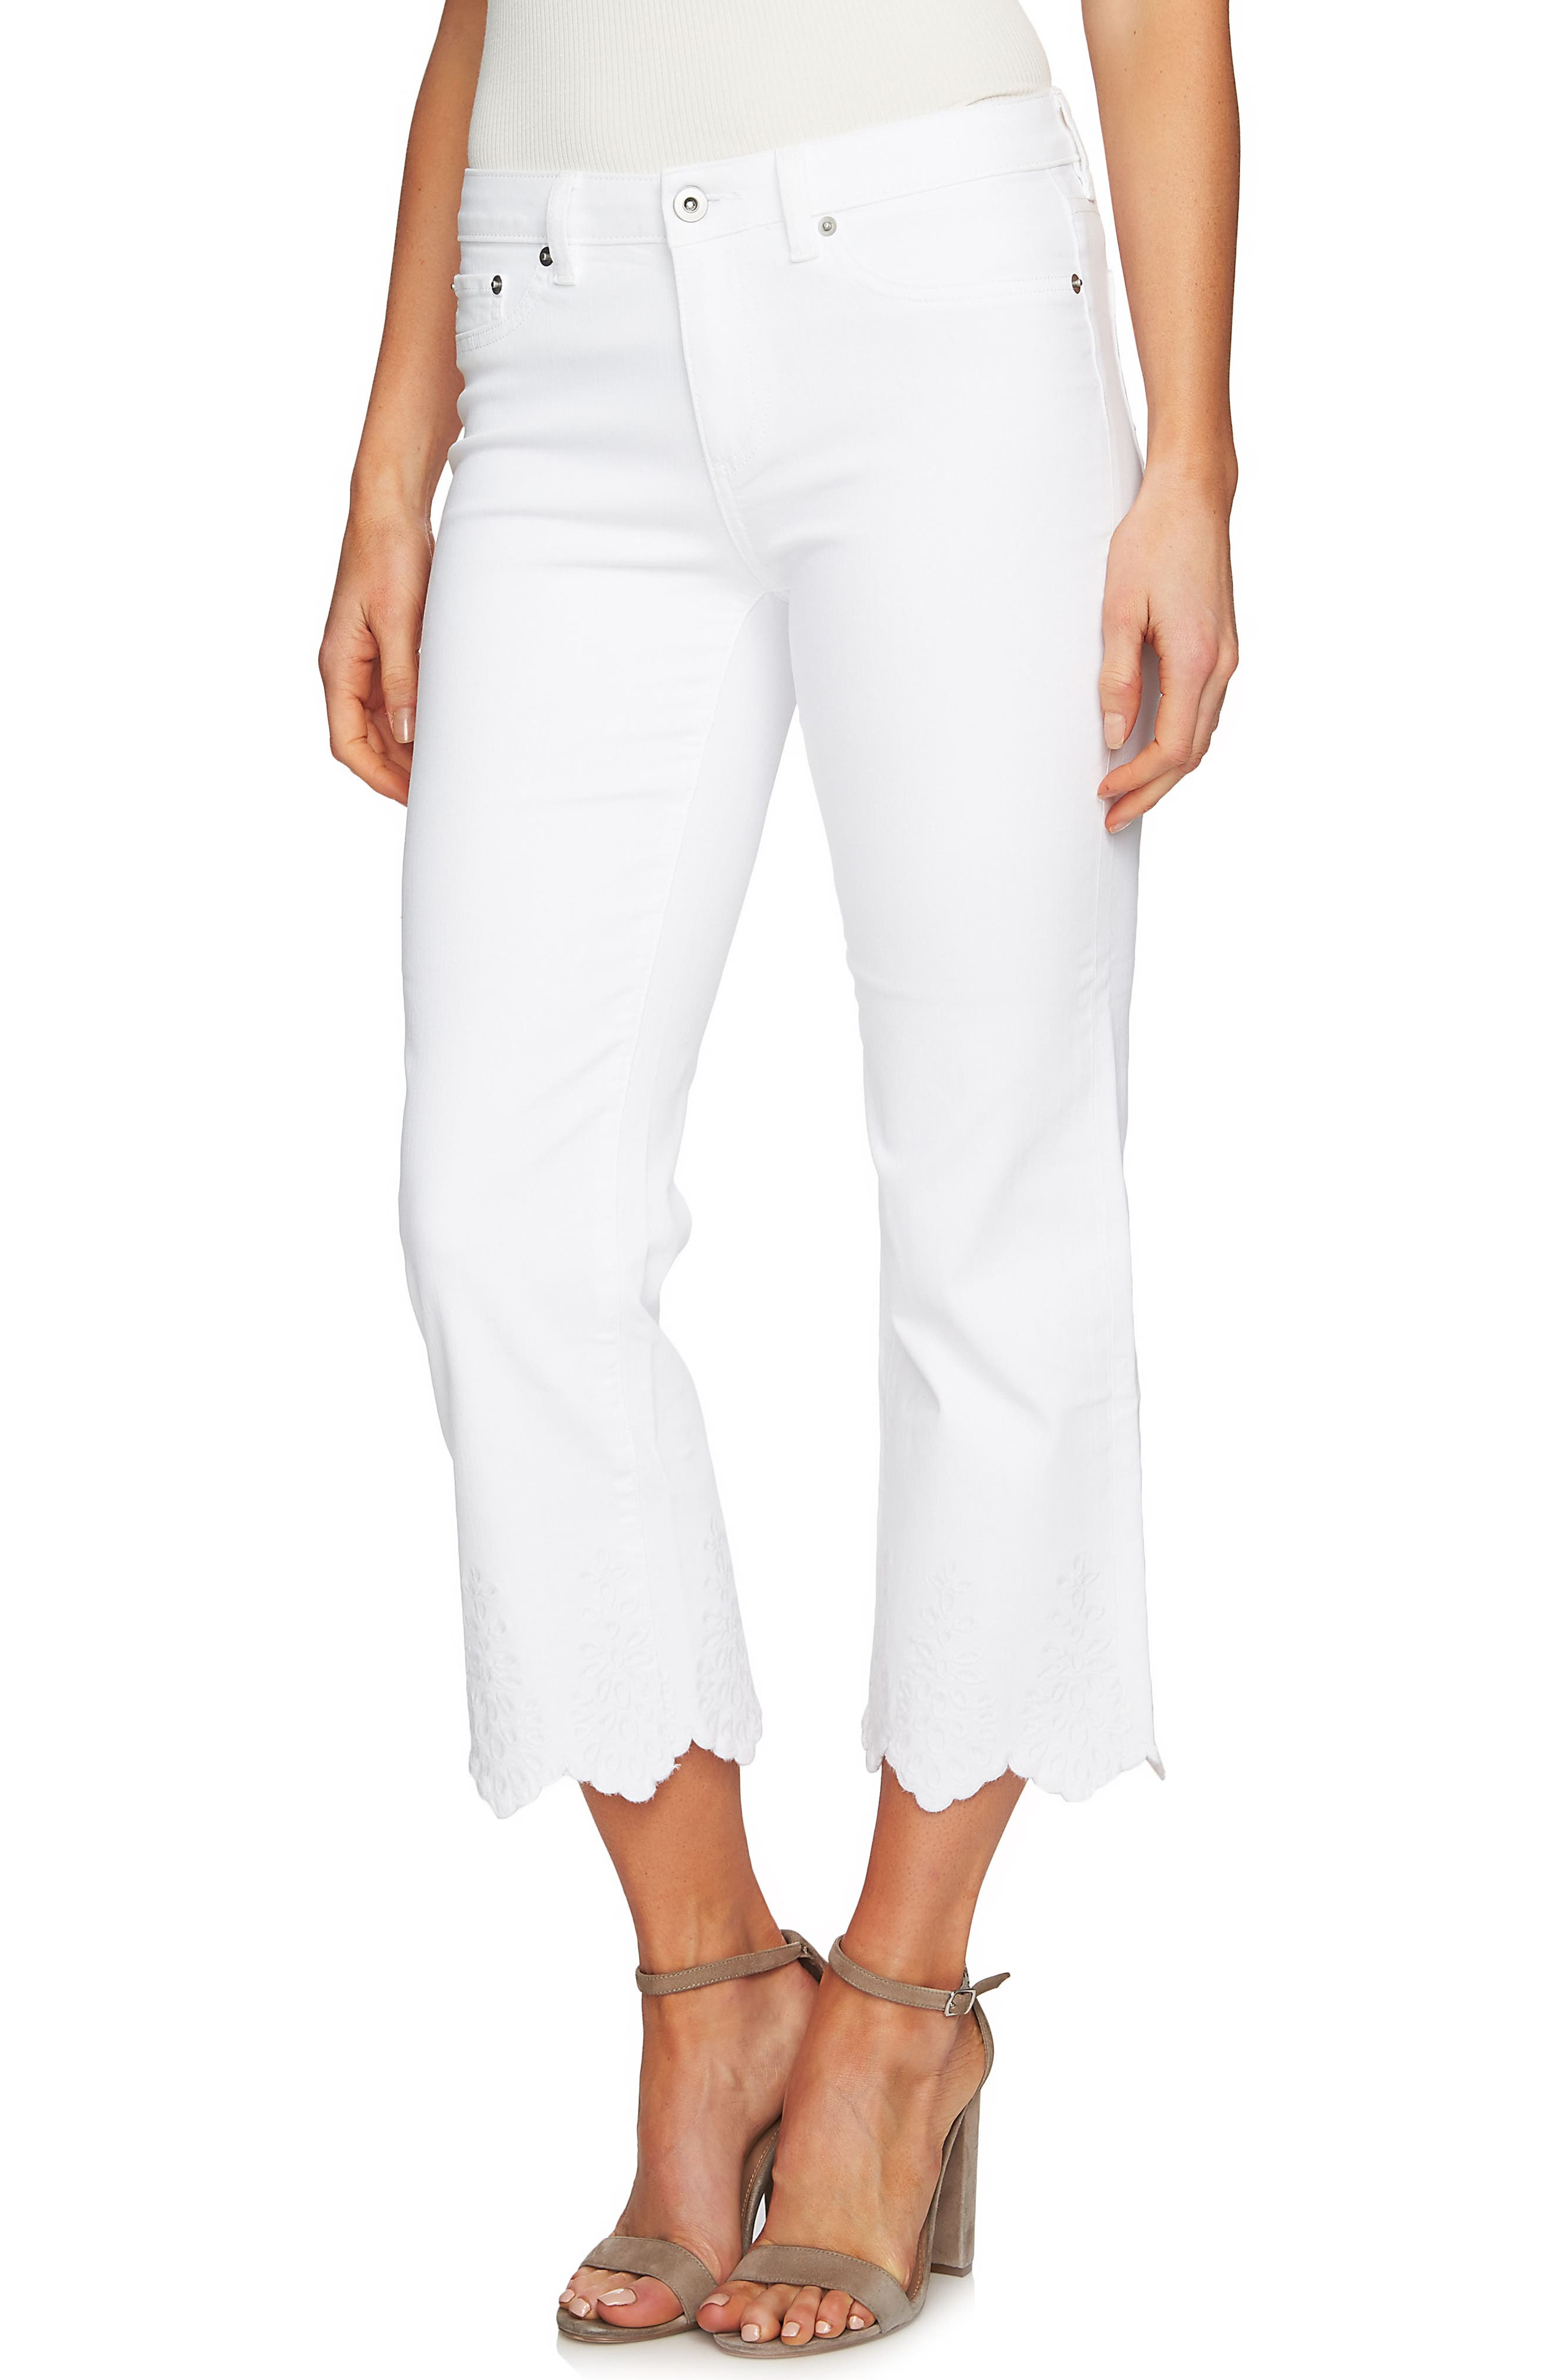 CeCe Classic Lace Hem Skinny Jeans